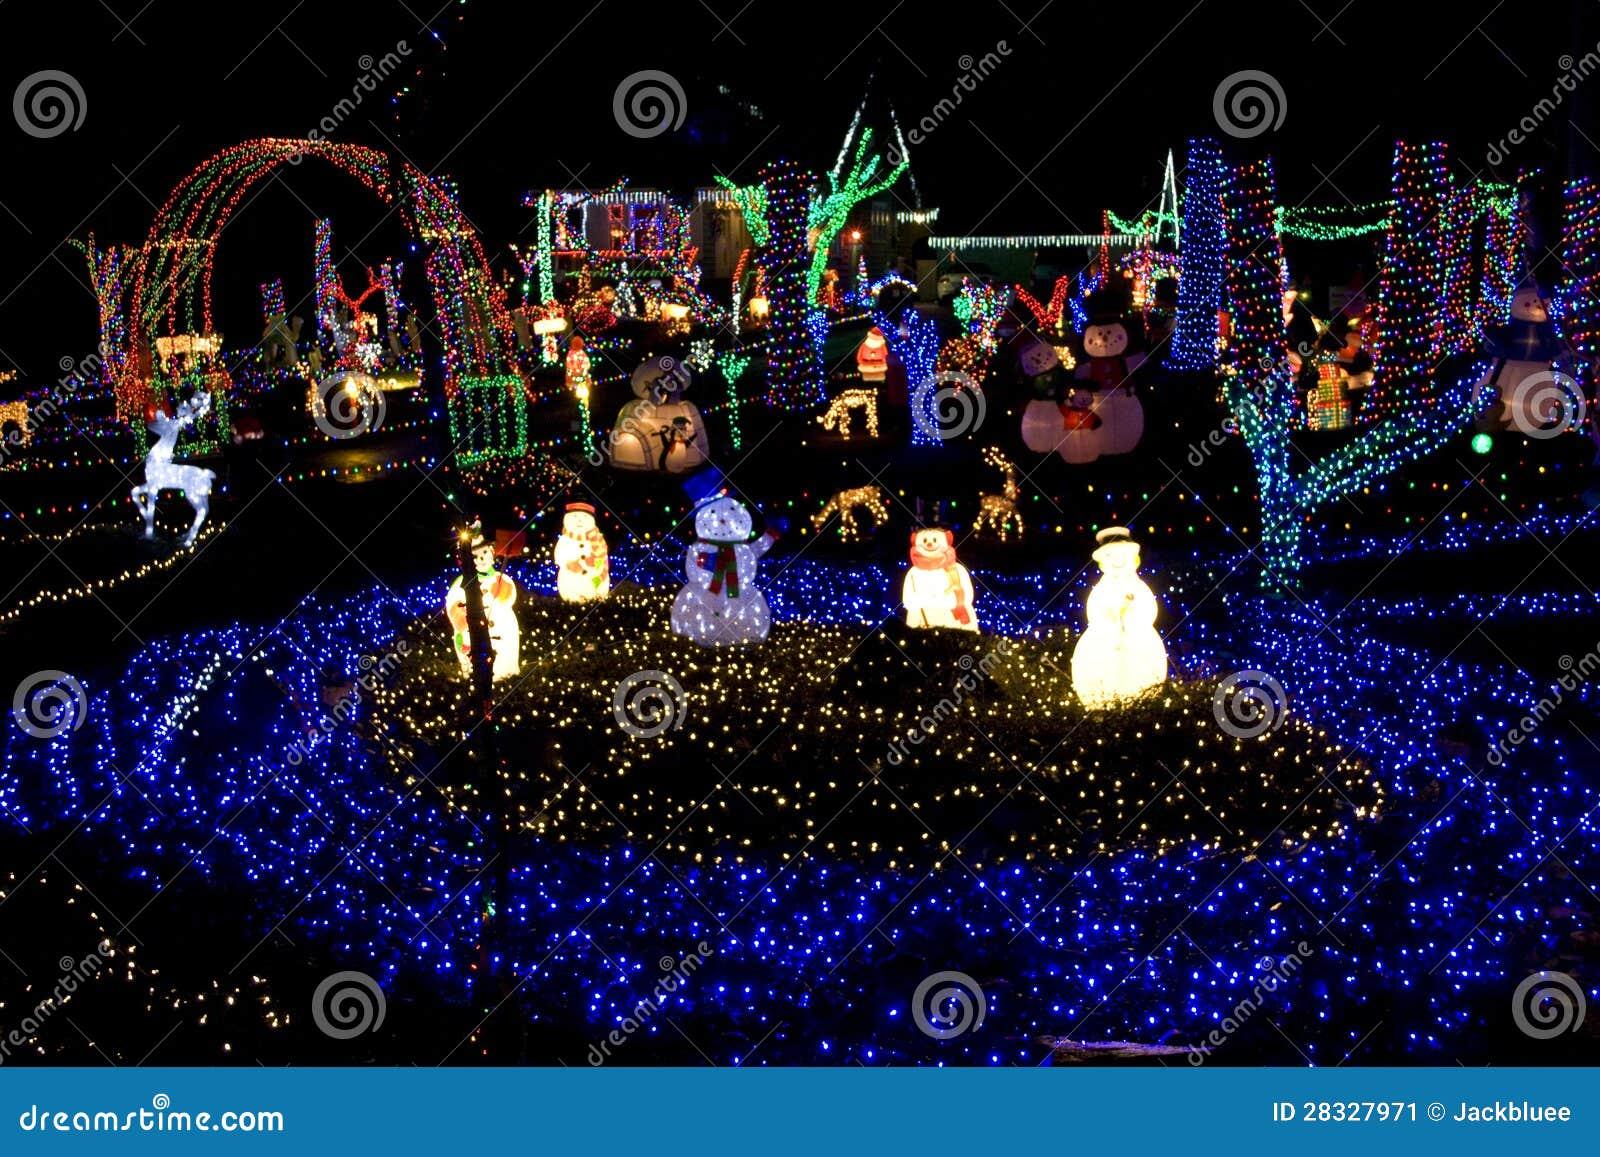 Christmas Land.Christmas Land Of Lights Stock Image Image Of Celebration